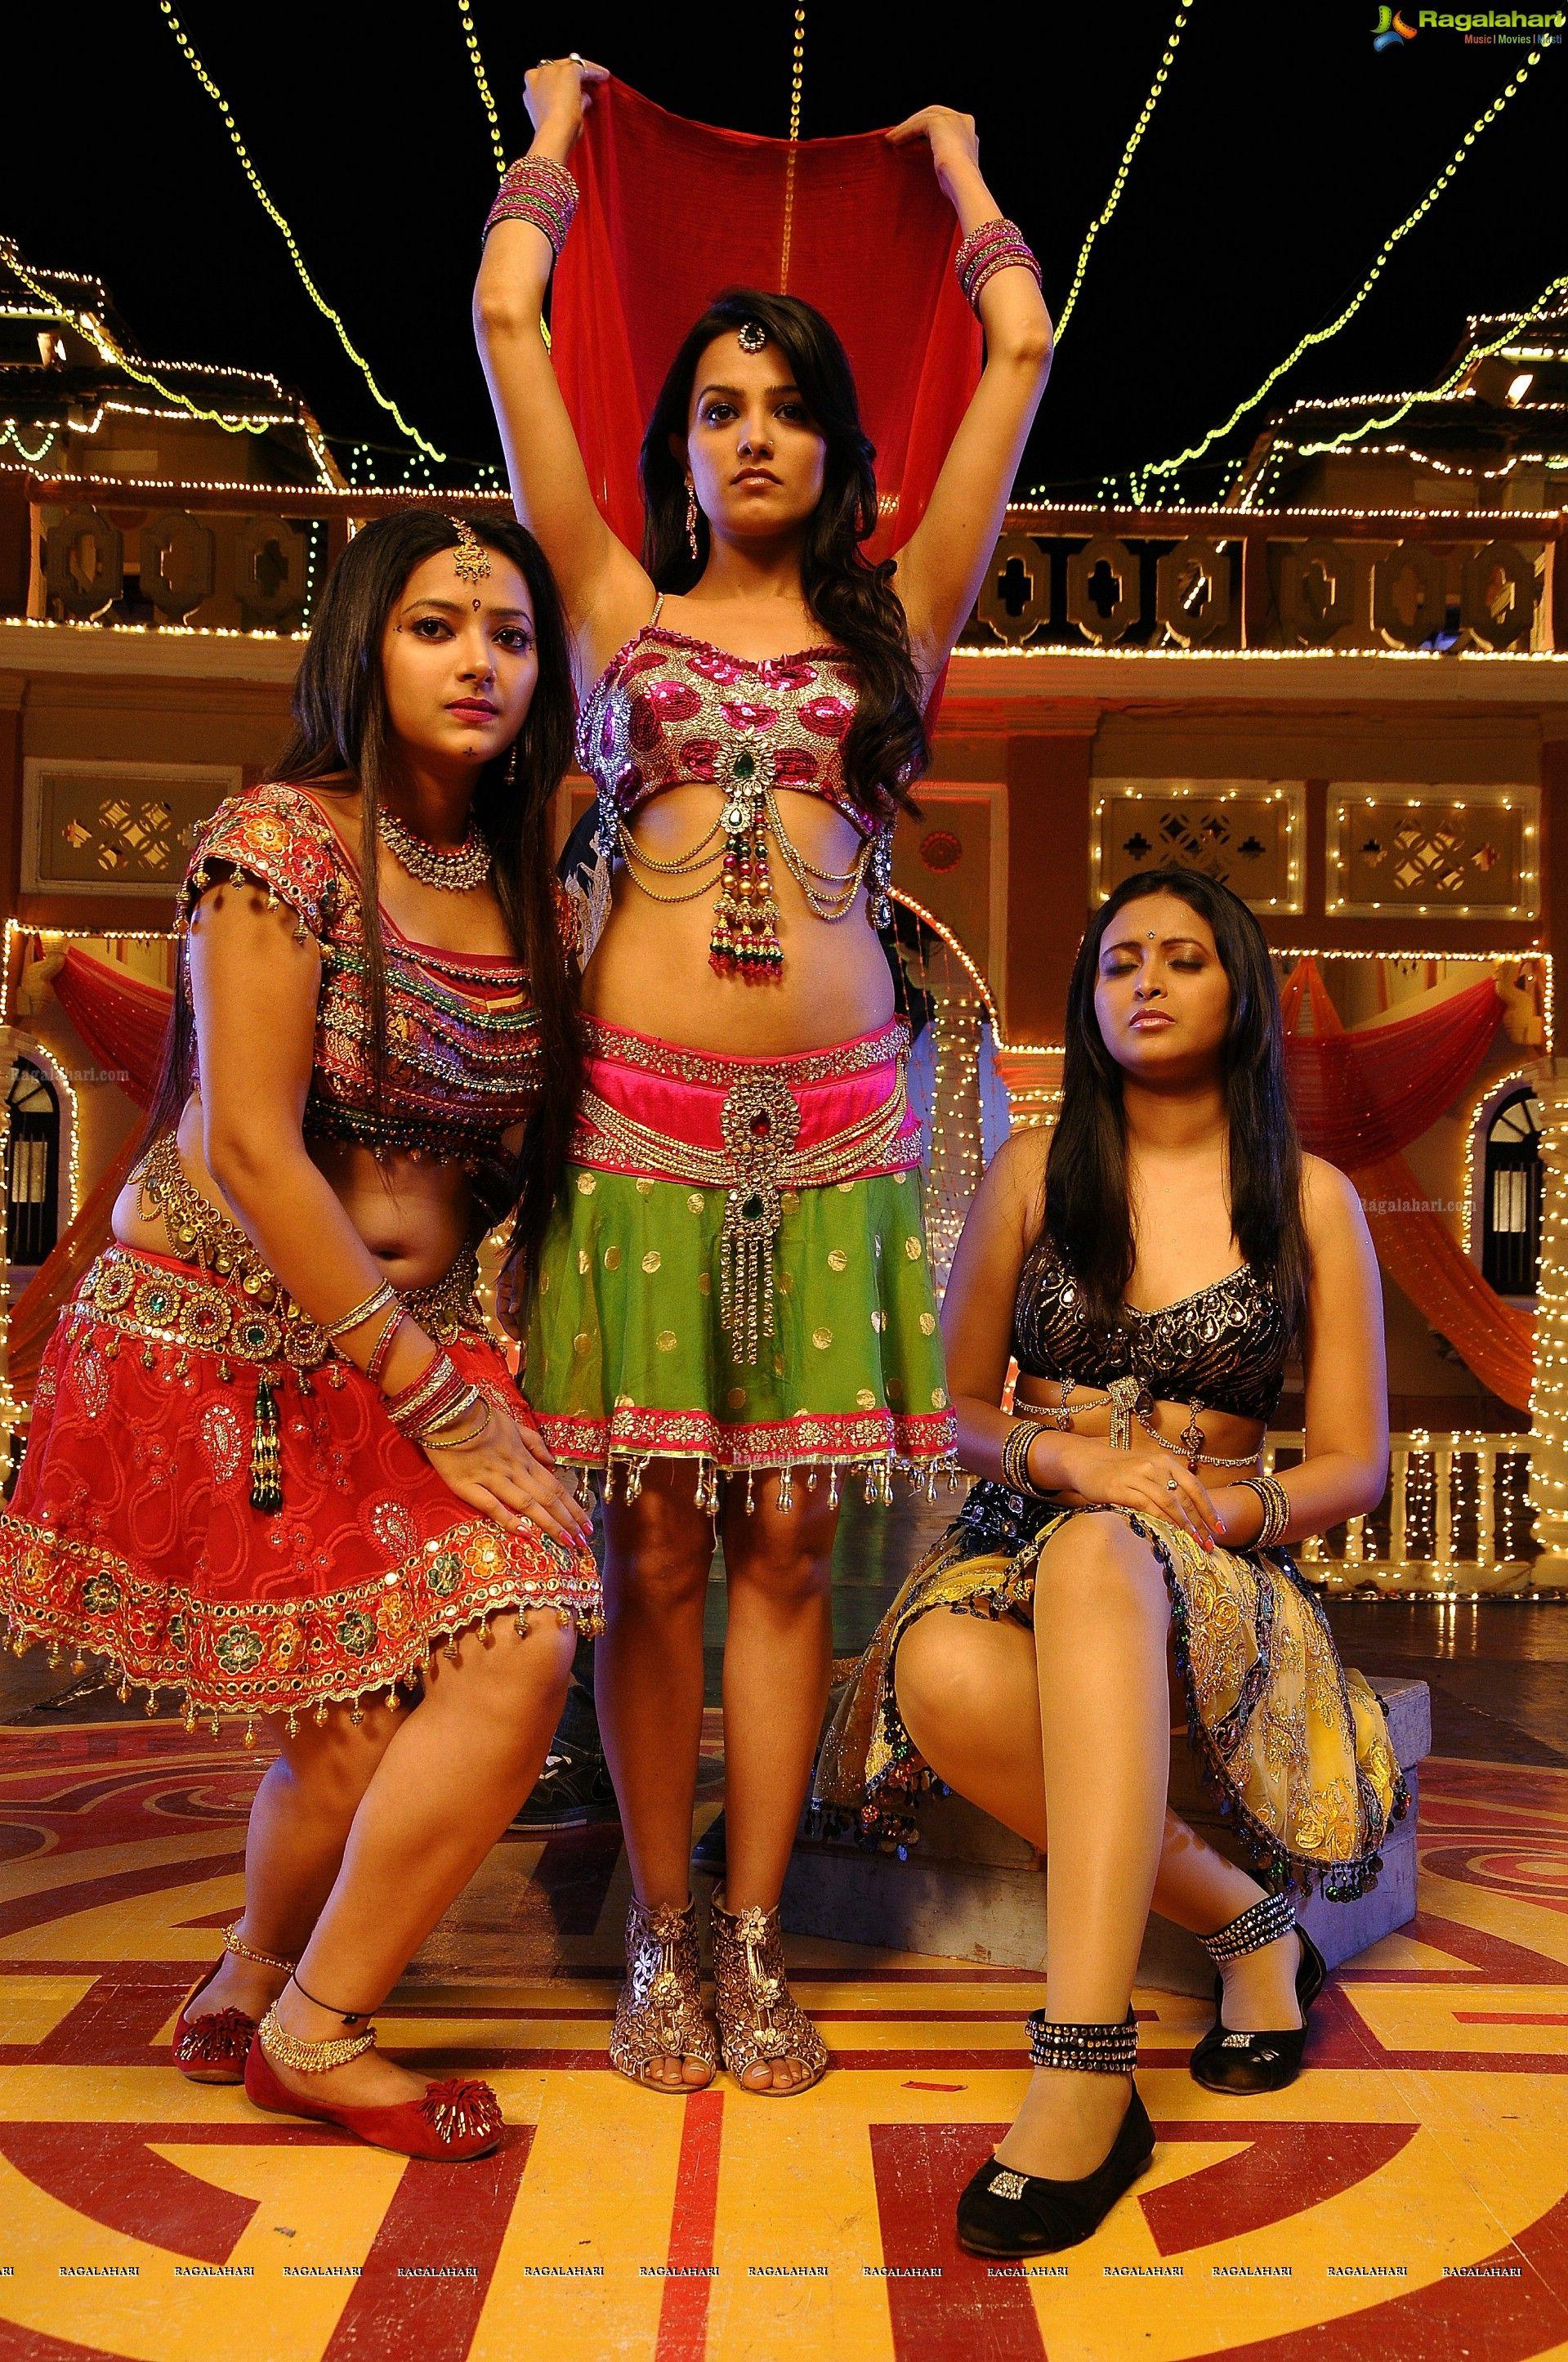 dibri-dibri-item-song-genius   Indian Actress & Model   Pinterest ...